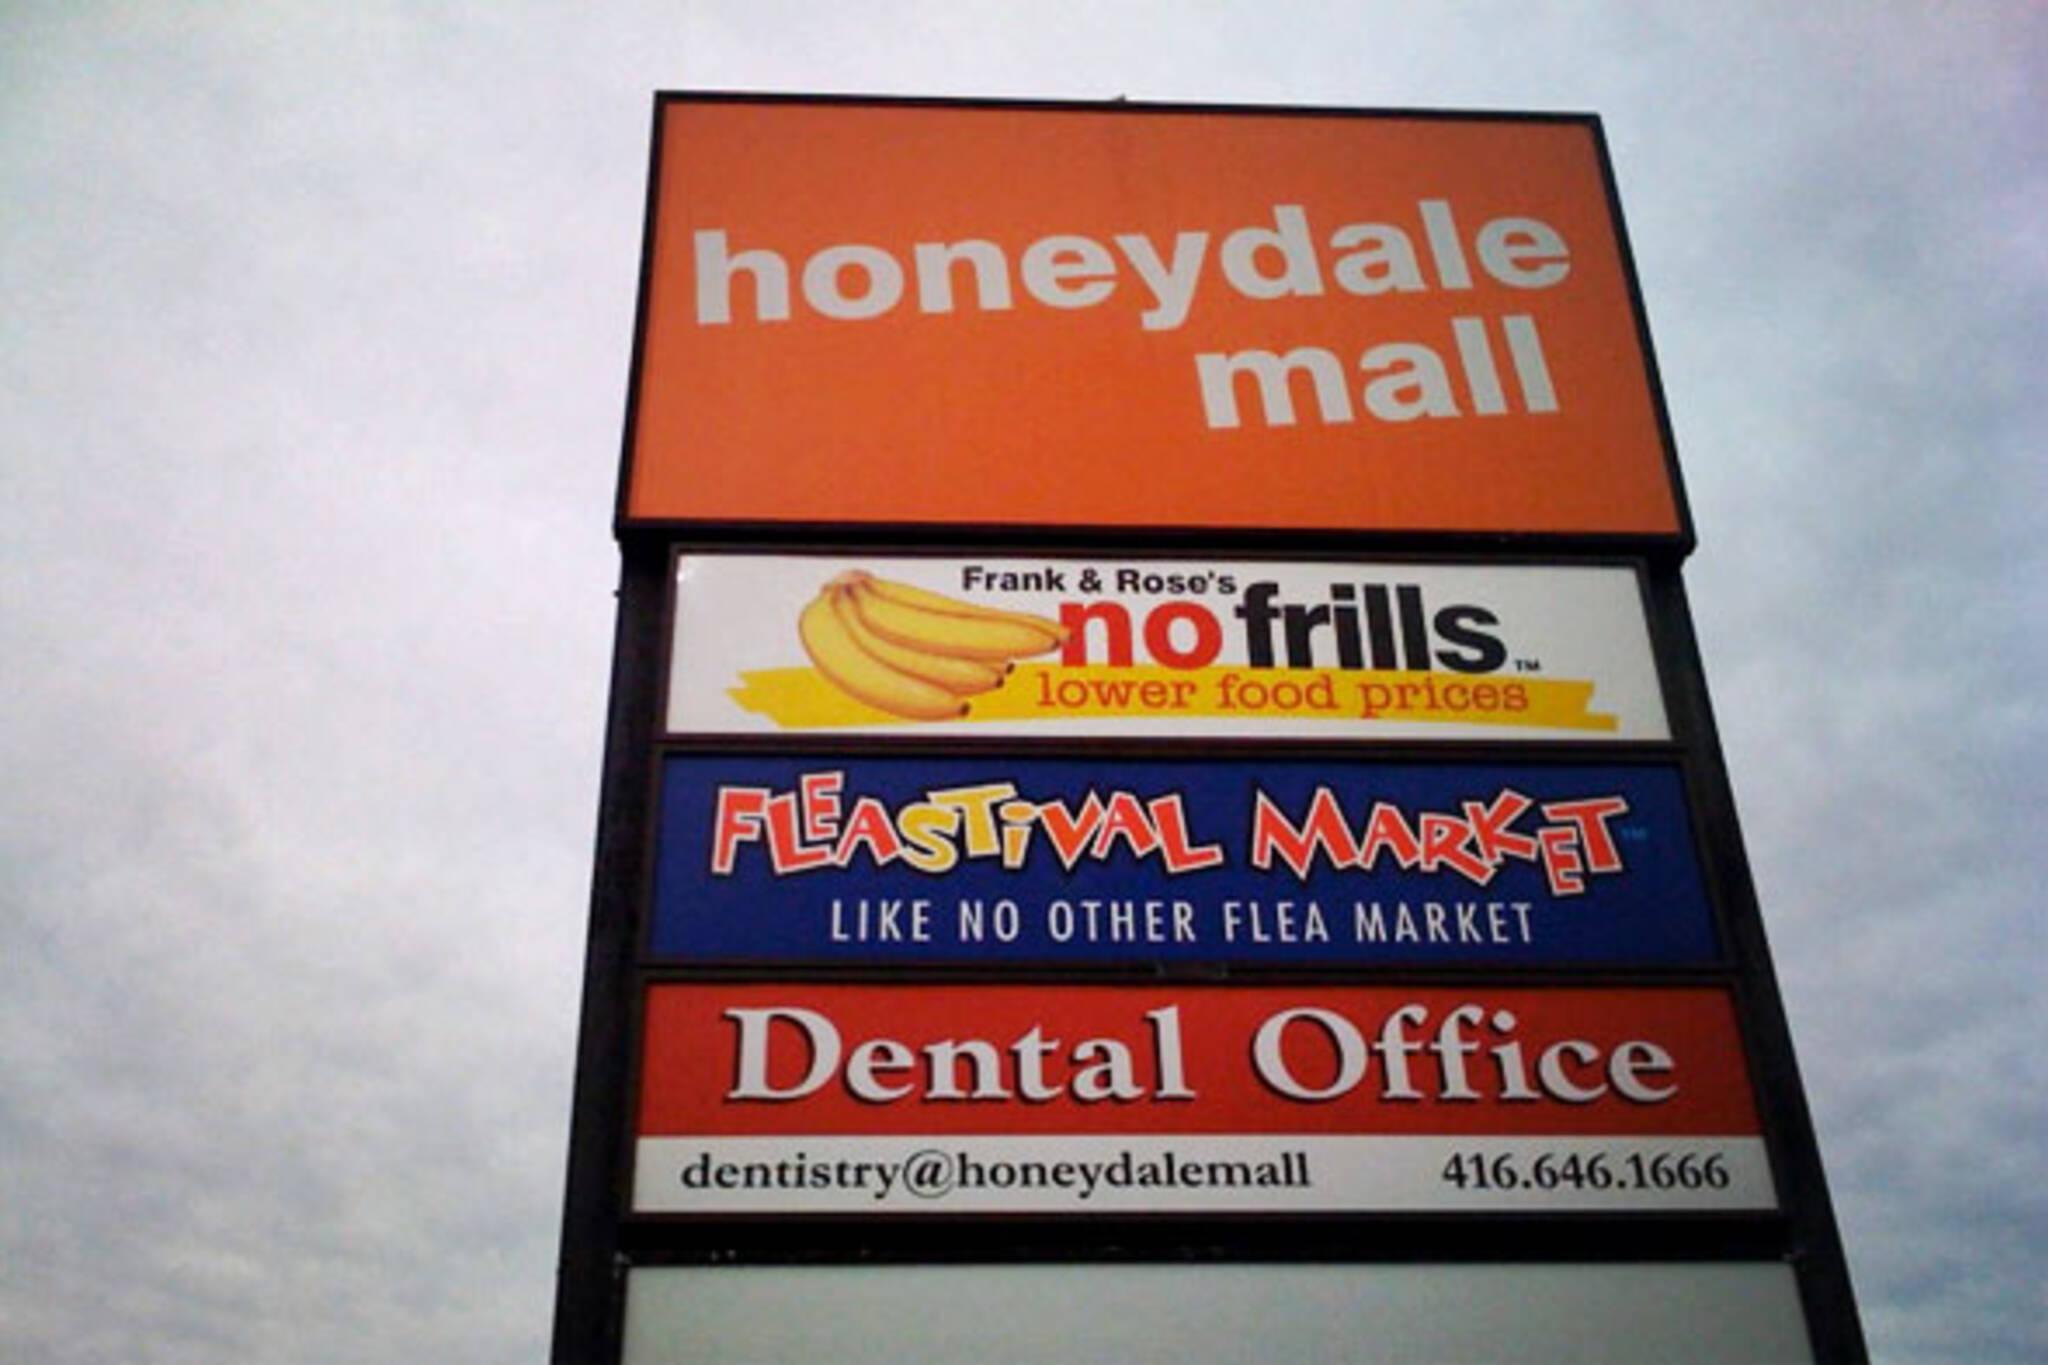 honeydale mall etobicoke